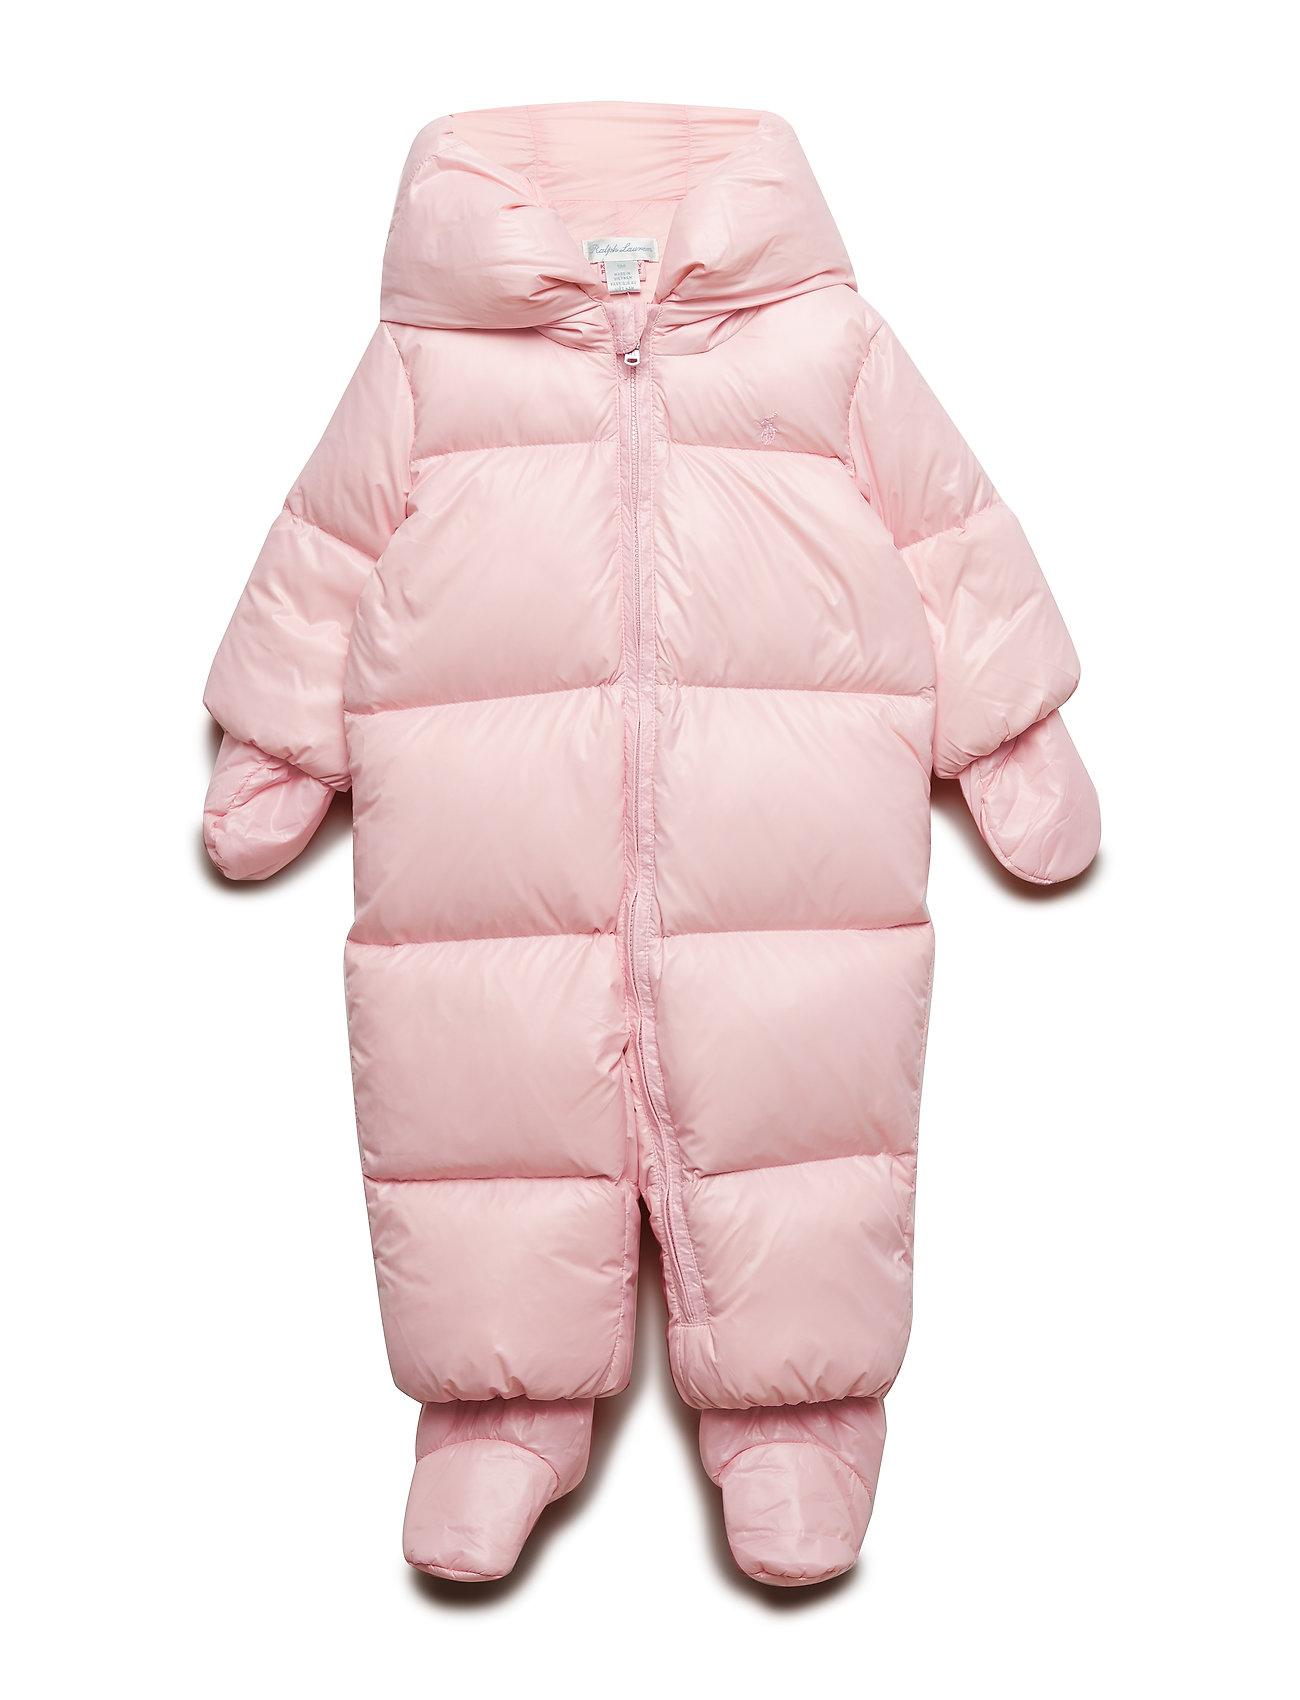 Ralph Lauren Baby Quilted Down Snowsuit - HINT OF PINK